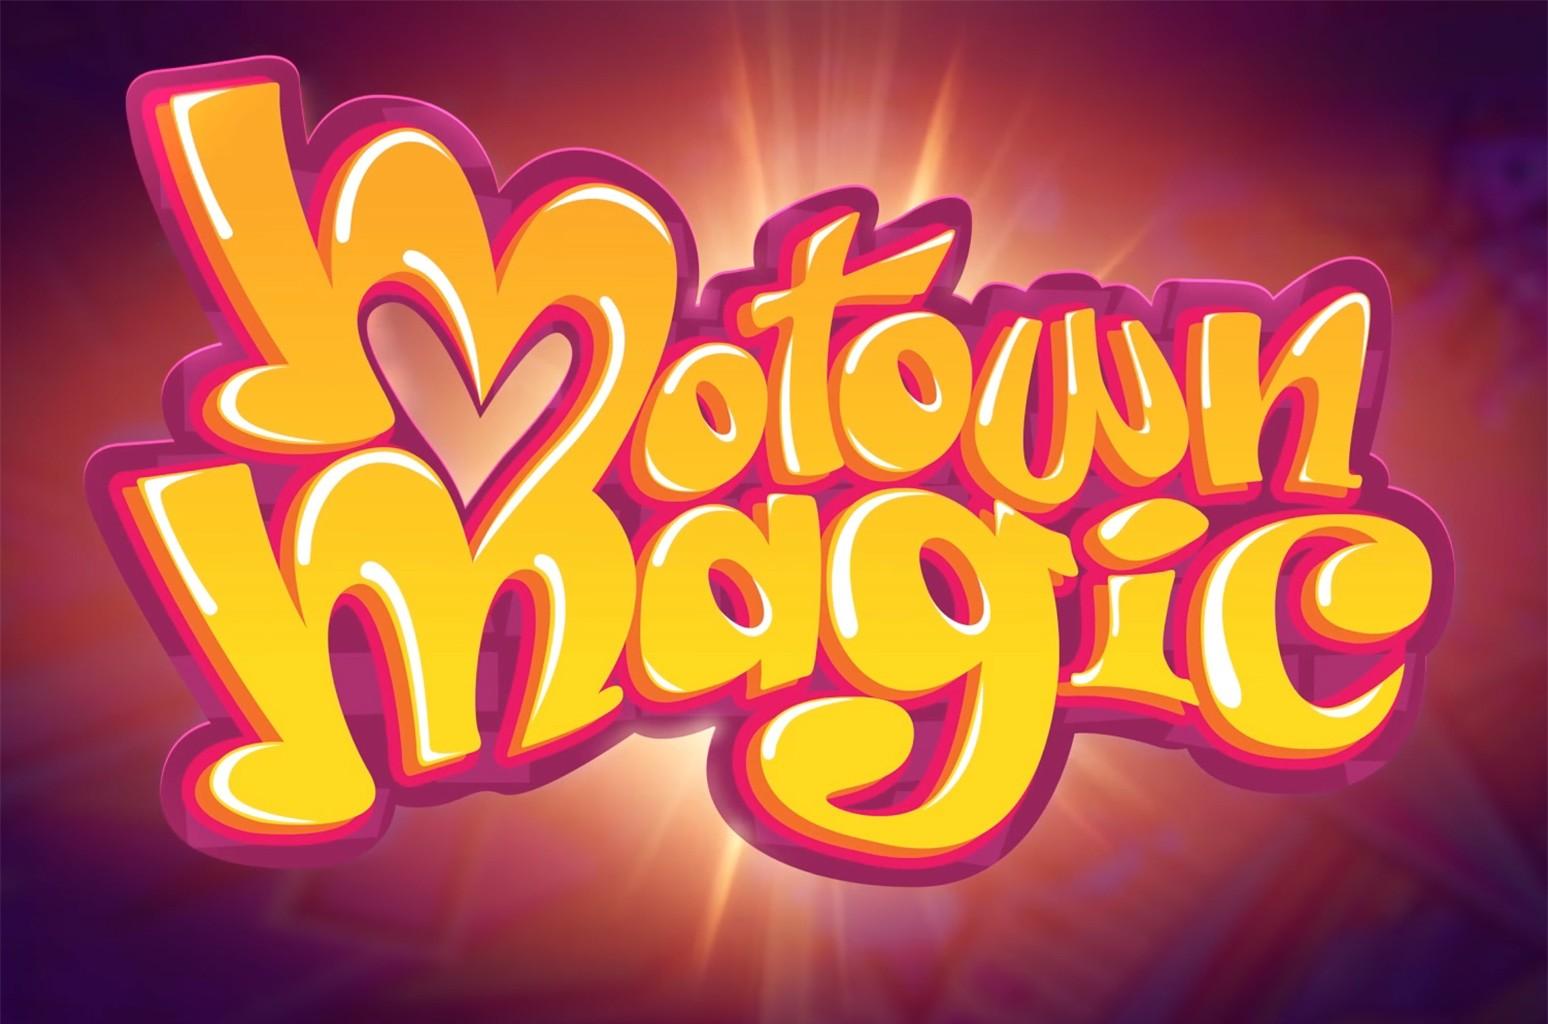 2.16 Motown Magic